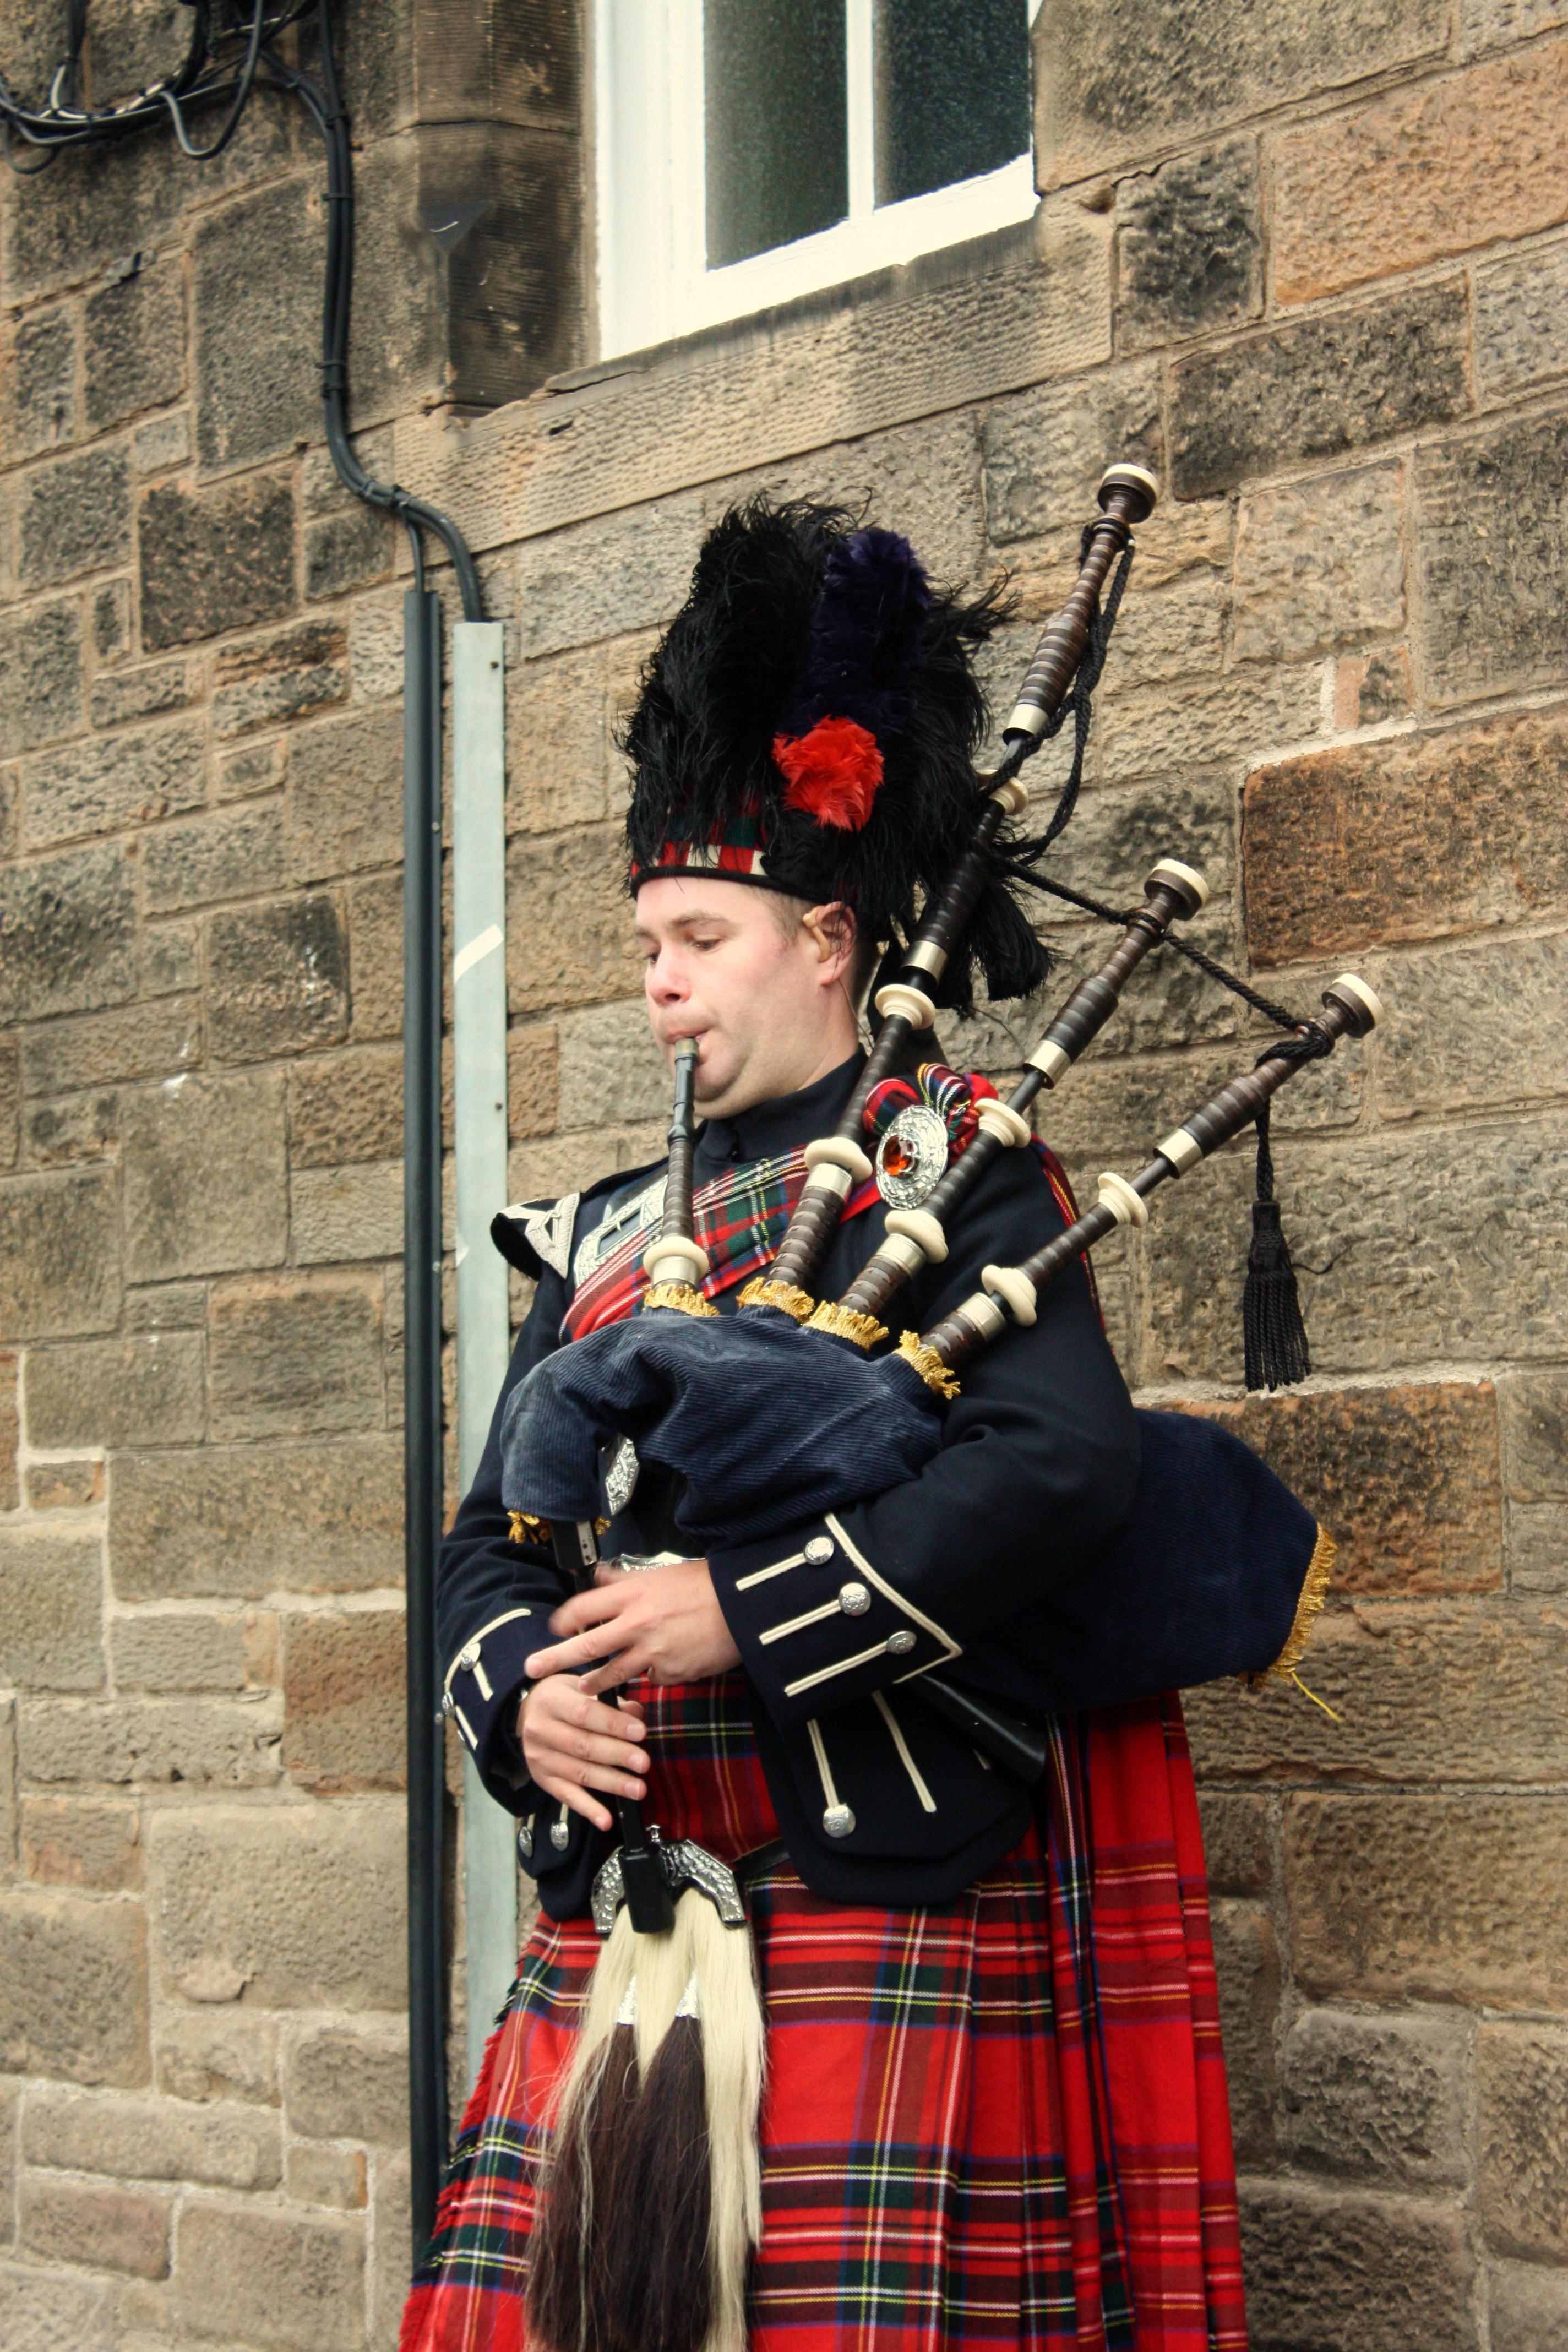 A piper busking in central Edinburgh.